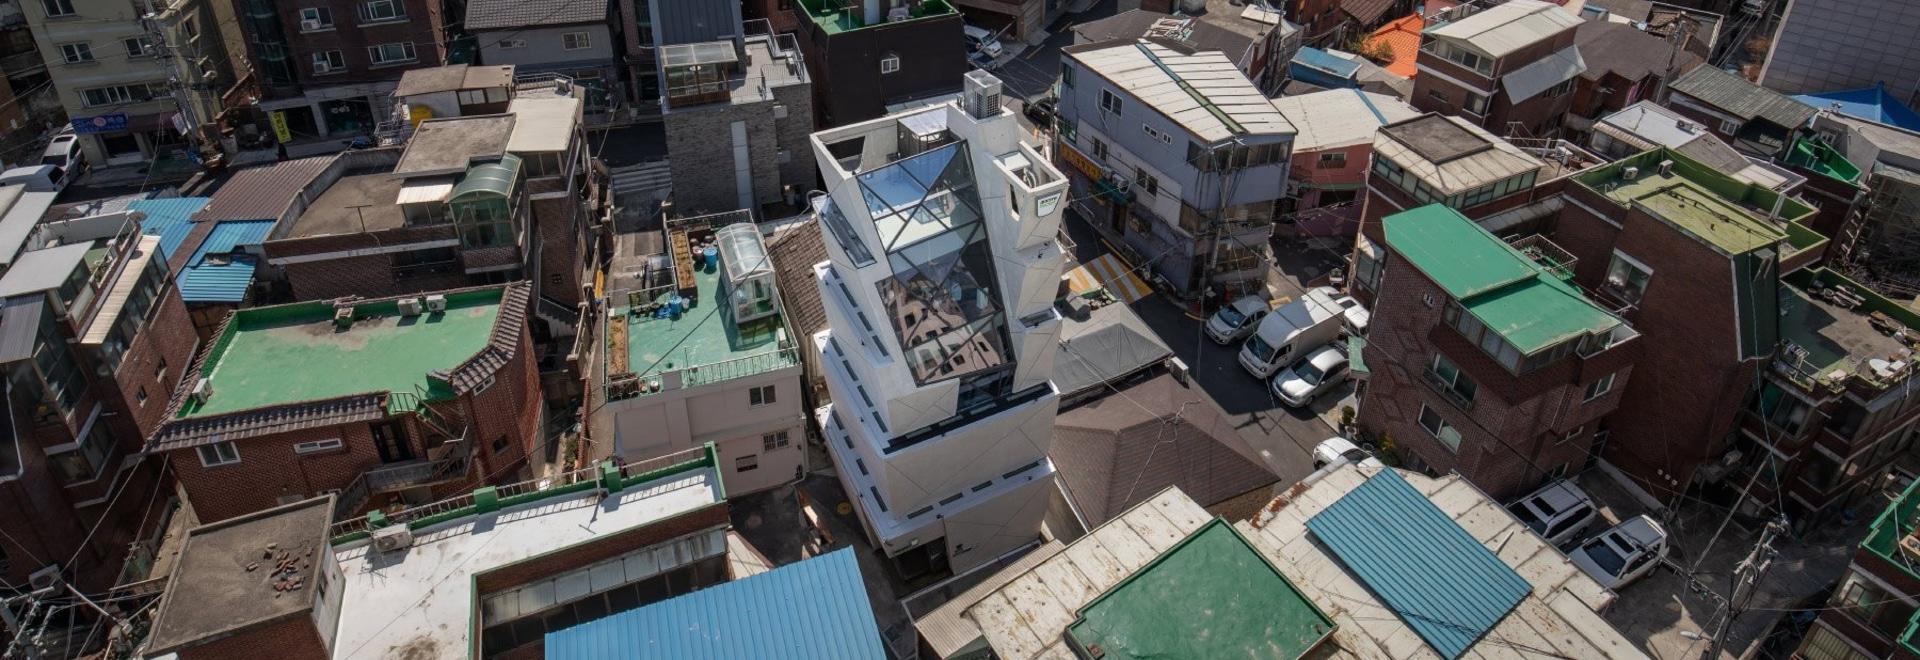 moon hoon manipula una pila de'cubos' para el aceite de sésamo HQ en Seúl